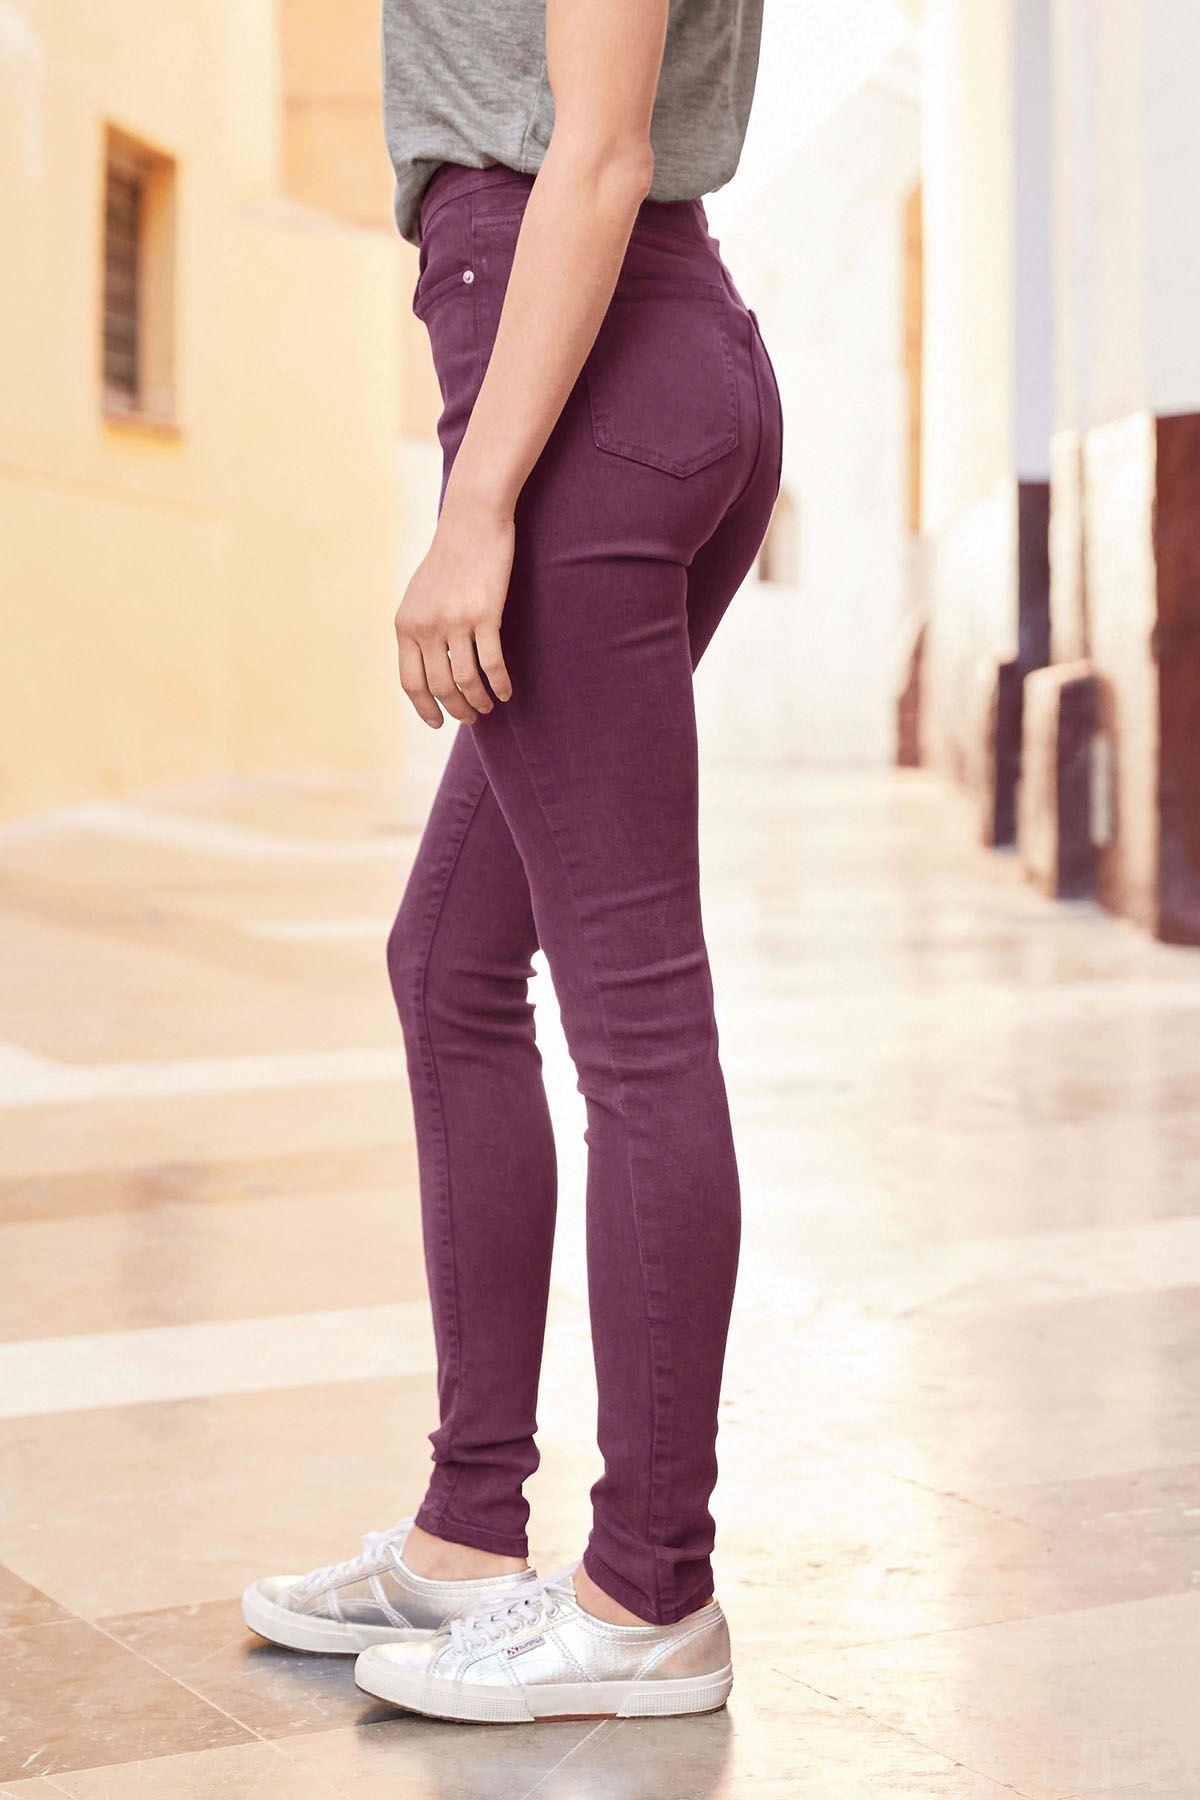 N*XT Ladies Supersoft Skinny Jeans Khaki Dusky Pink Burgundy Black